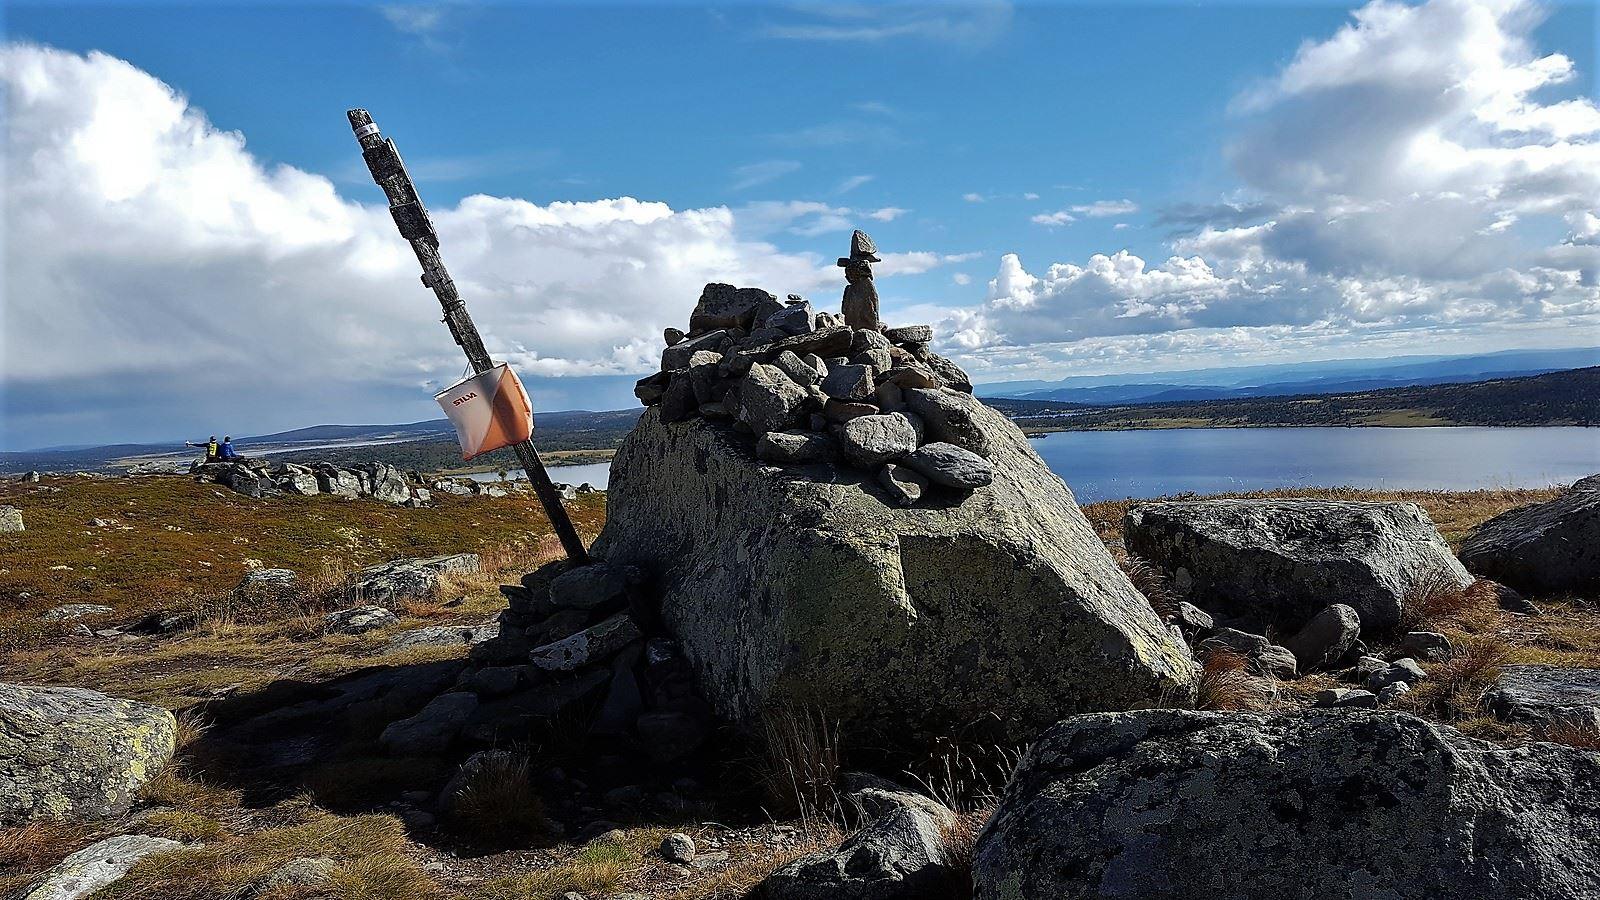 Fishing on the mountain